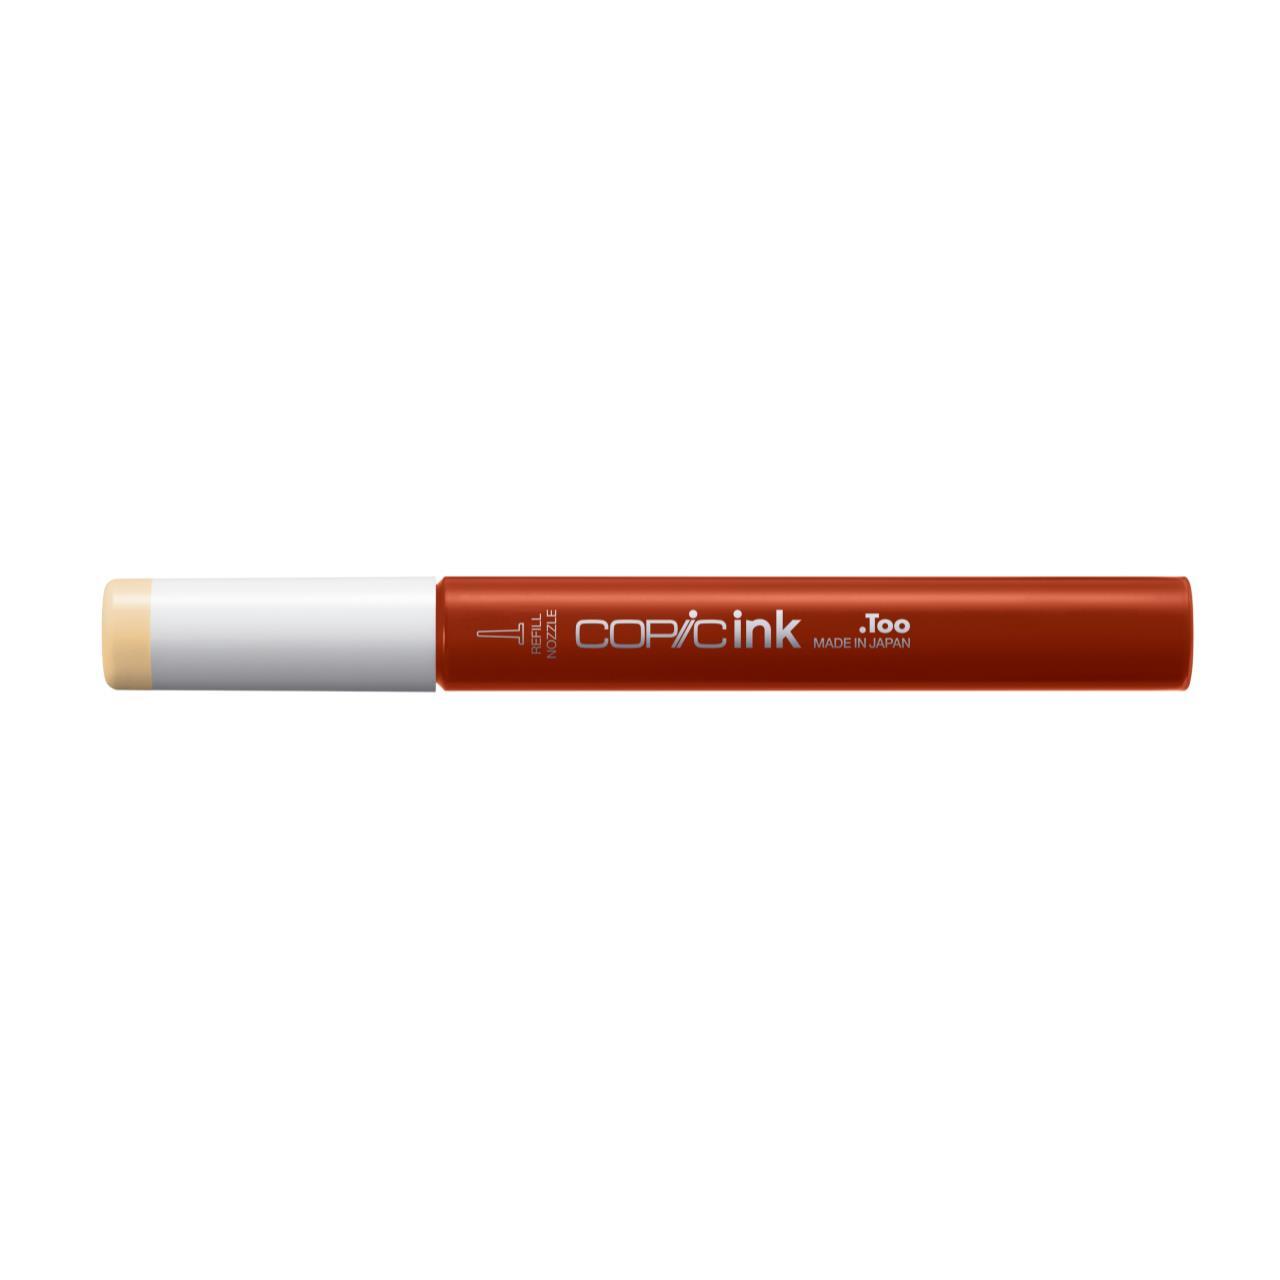 YR31 Light Reddish Yellow, Copic Ink - 4511338058763